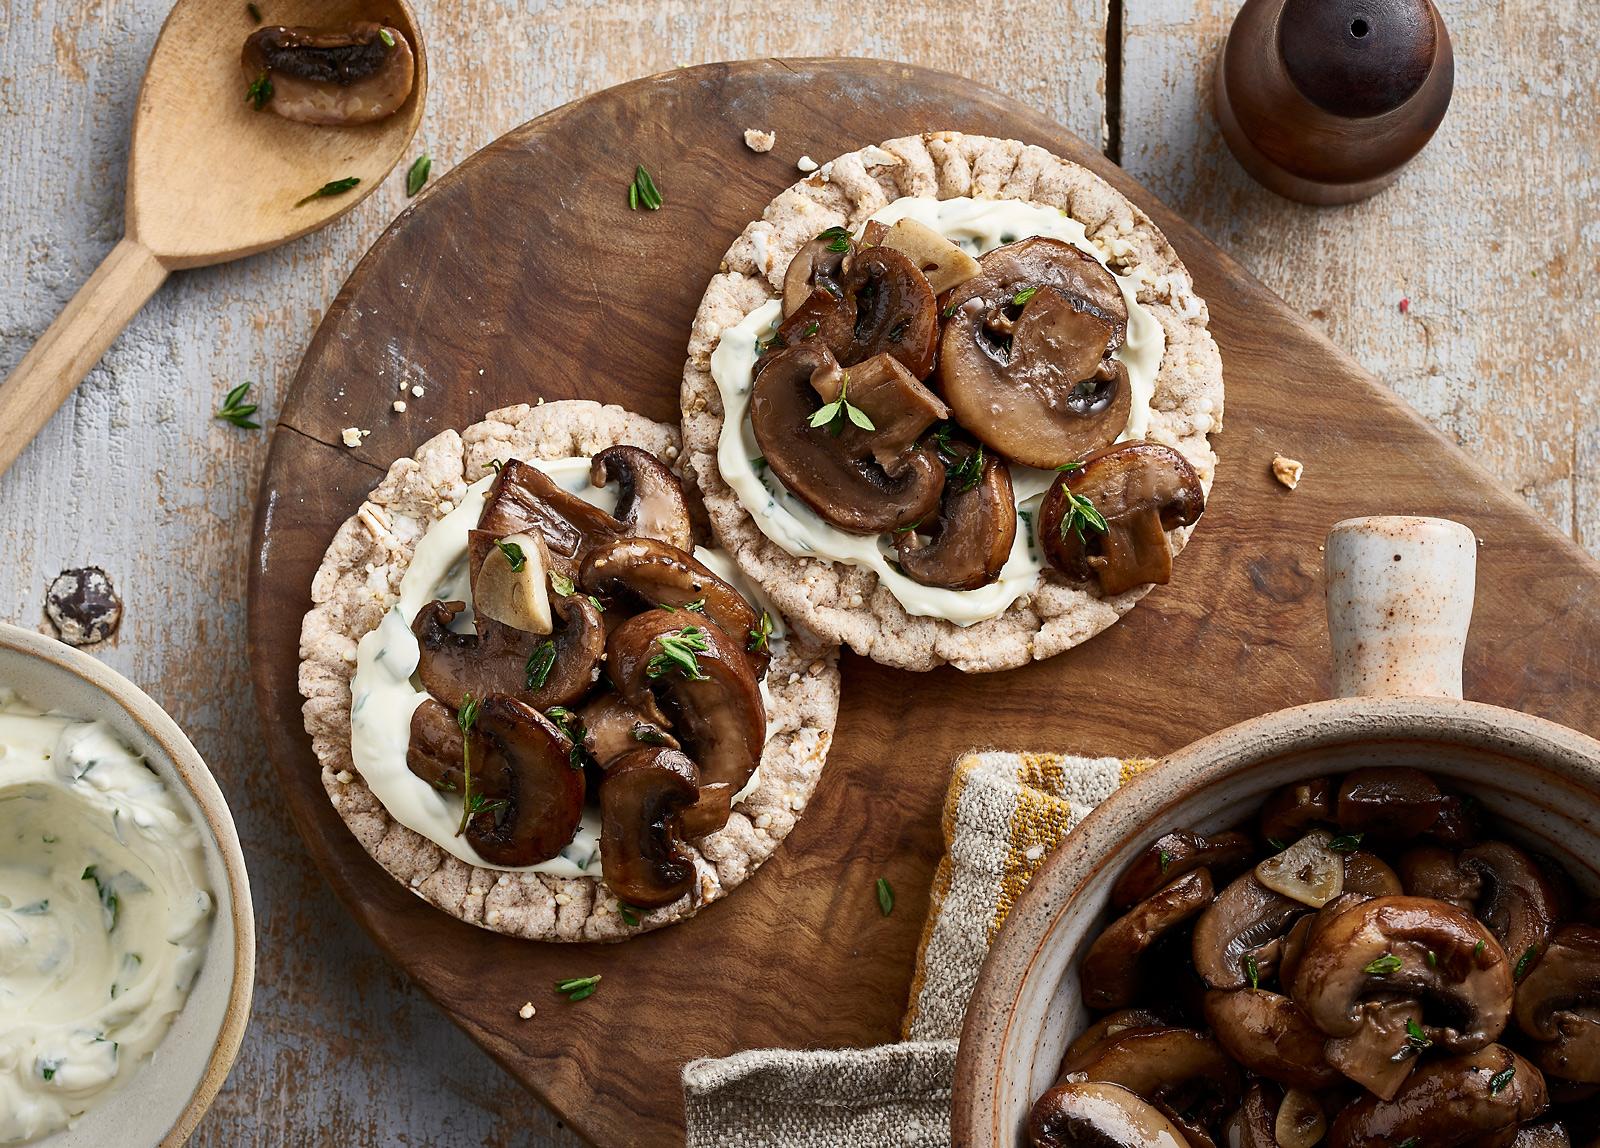 Garlic & Thyme Wild Mushrooms with Tarragon Crème Fraiche